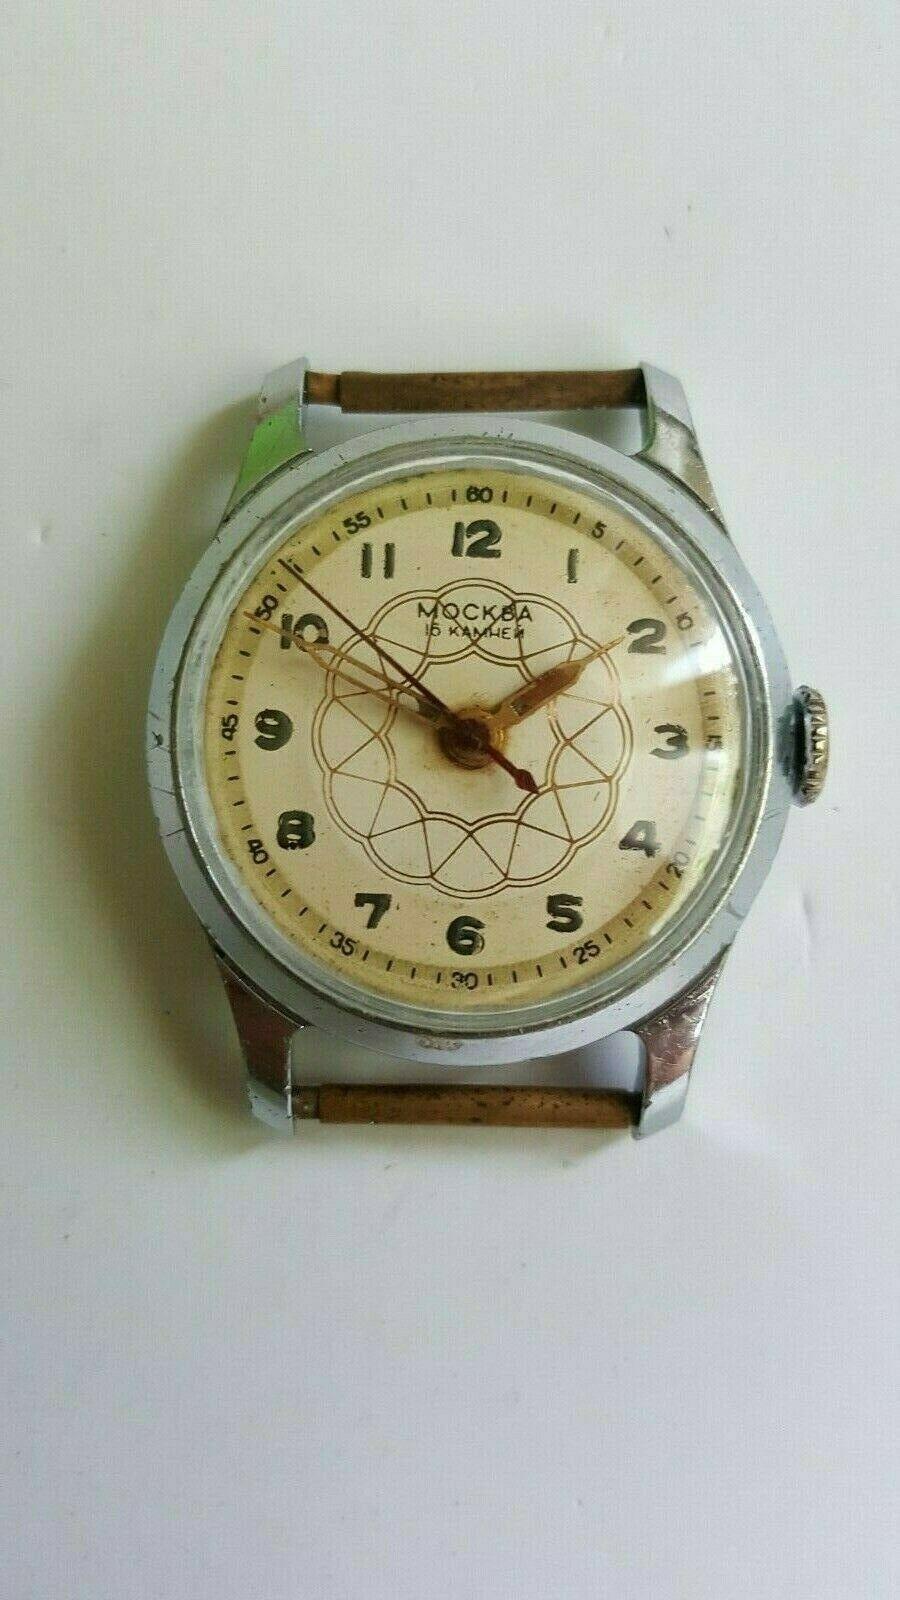 Les montres soviétiques radioactives S-l16060